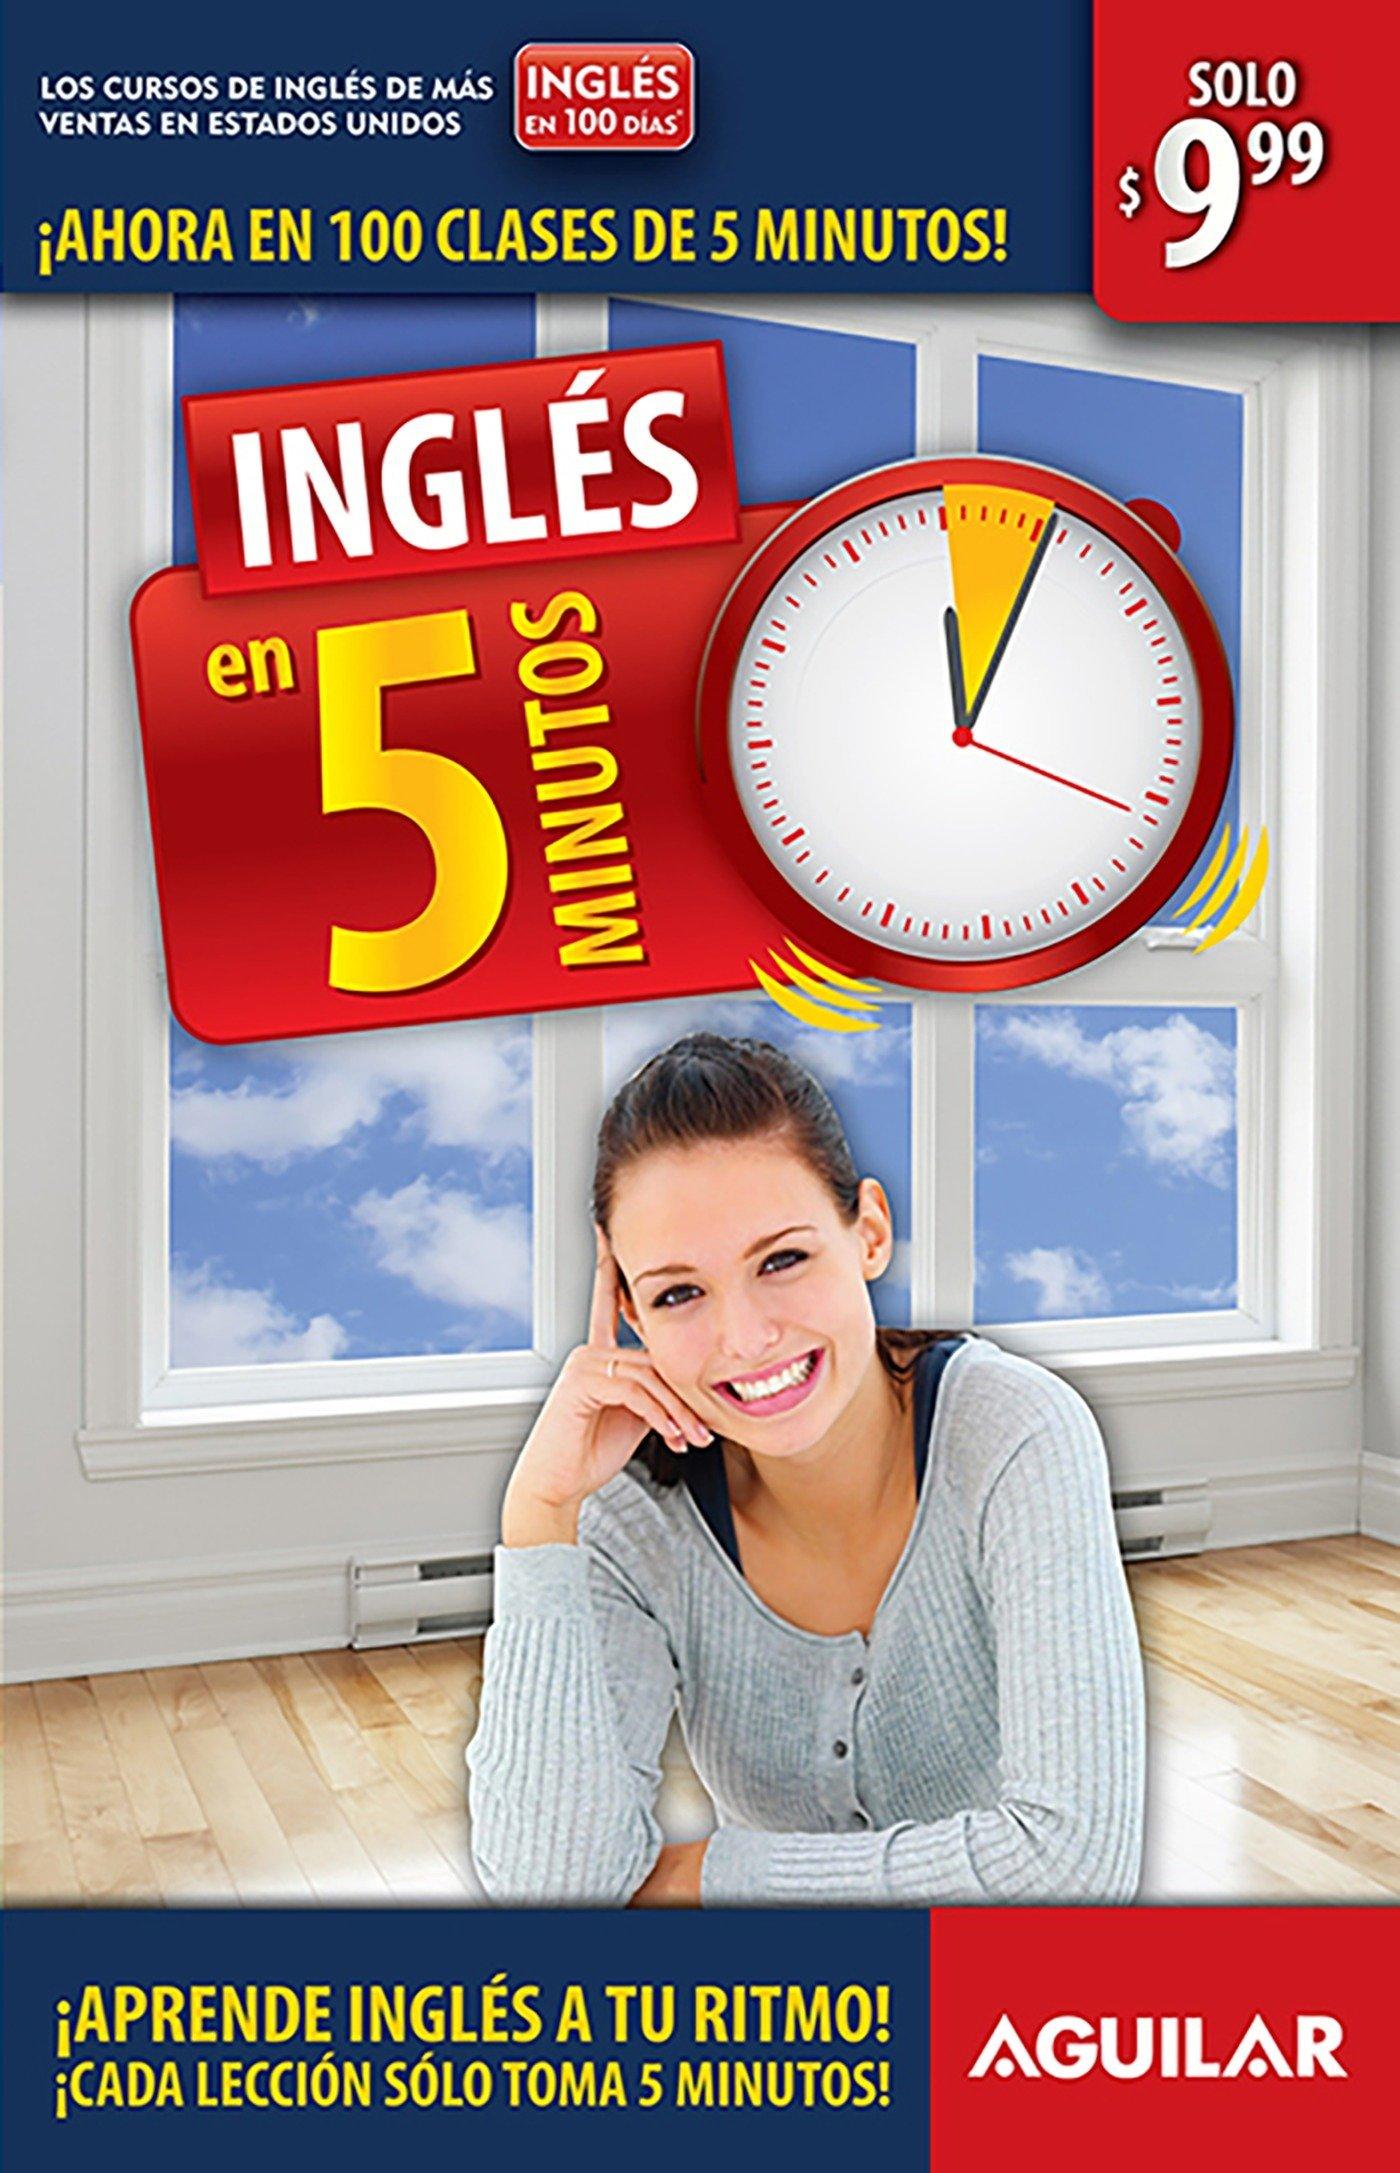 Download Inglés en 100 días - Inglés en 5 minutos / English in 100 Days - English in 5 Minutes (Spanish Edition) PDF Text fb2 book